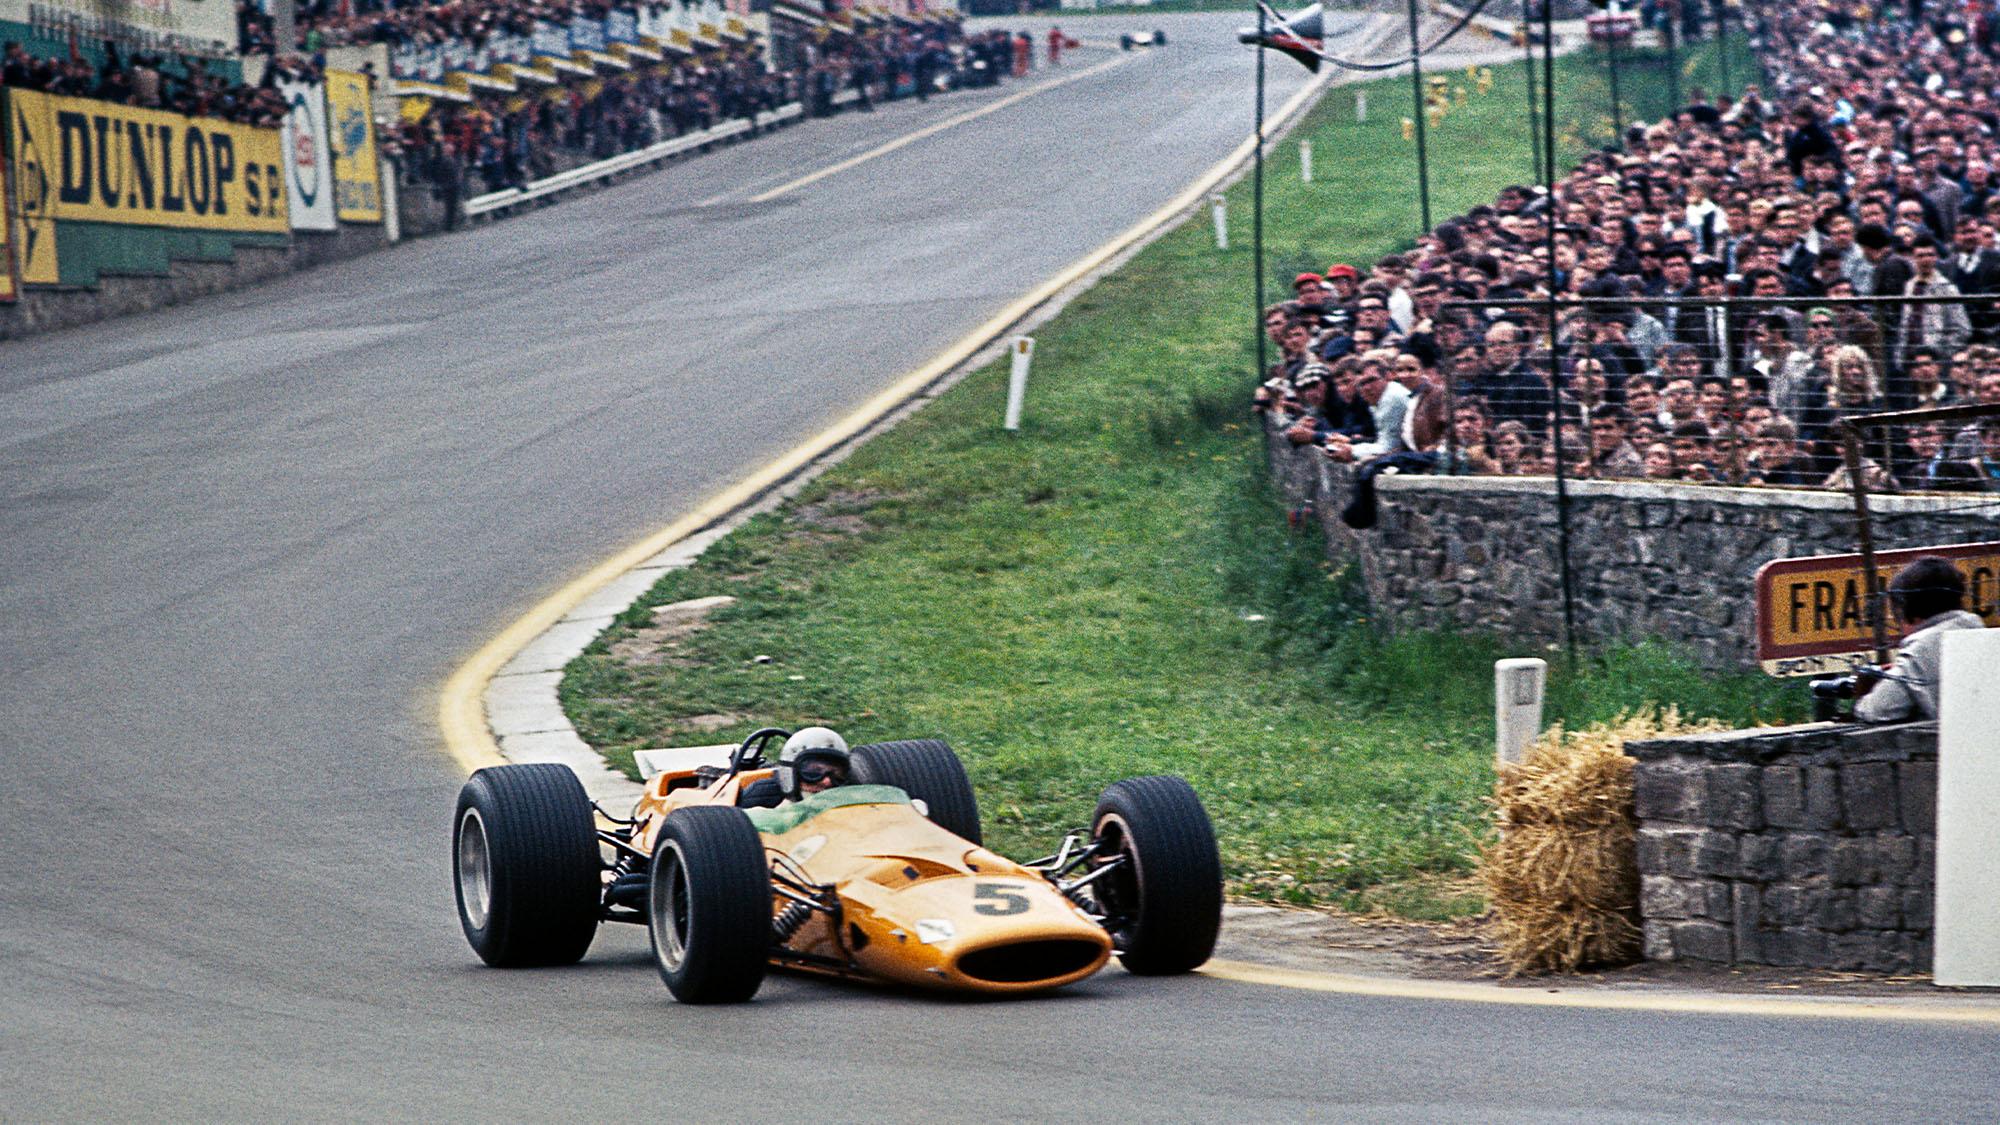 Bruce McLaren at eau Rouge during the 1968 Belgian Grand prix